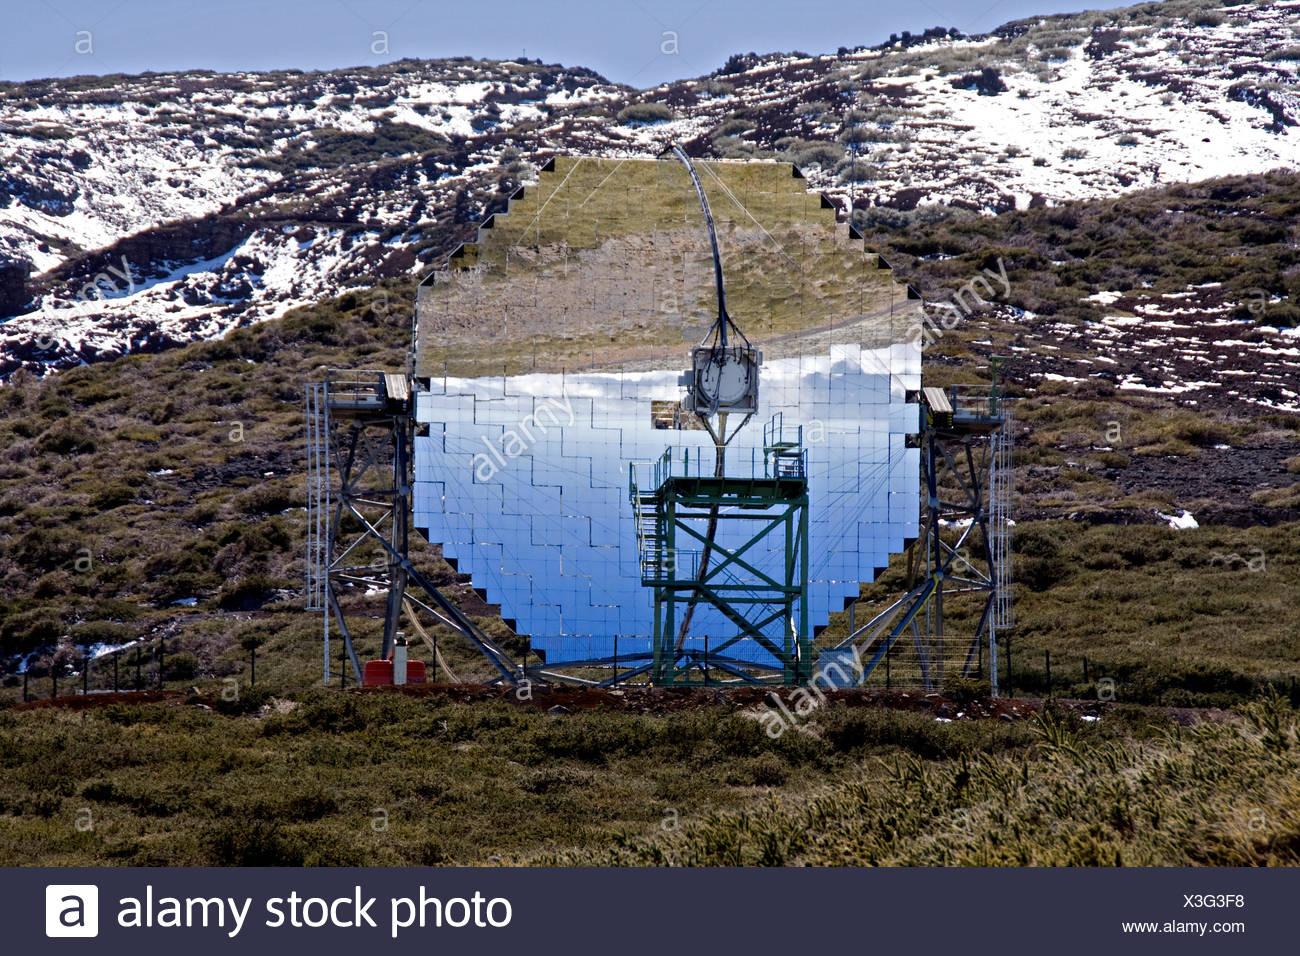 Jual teleskop astronomi di lapak diana jaya dianajaya